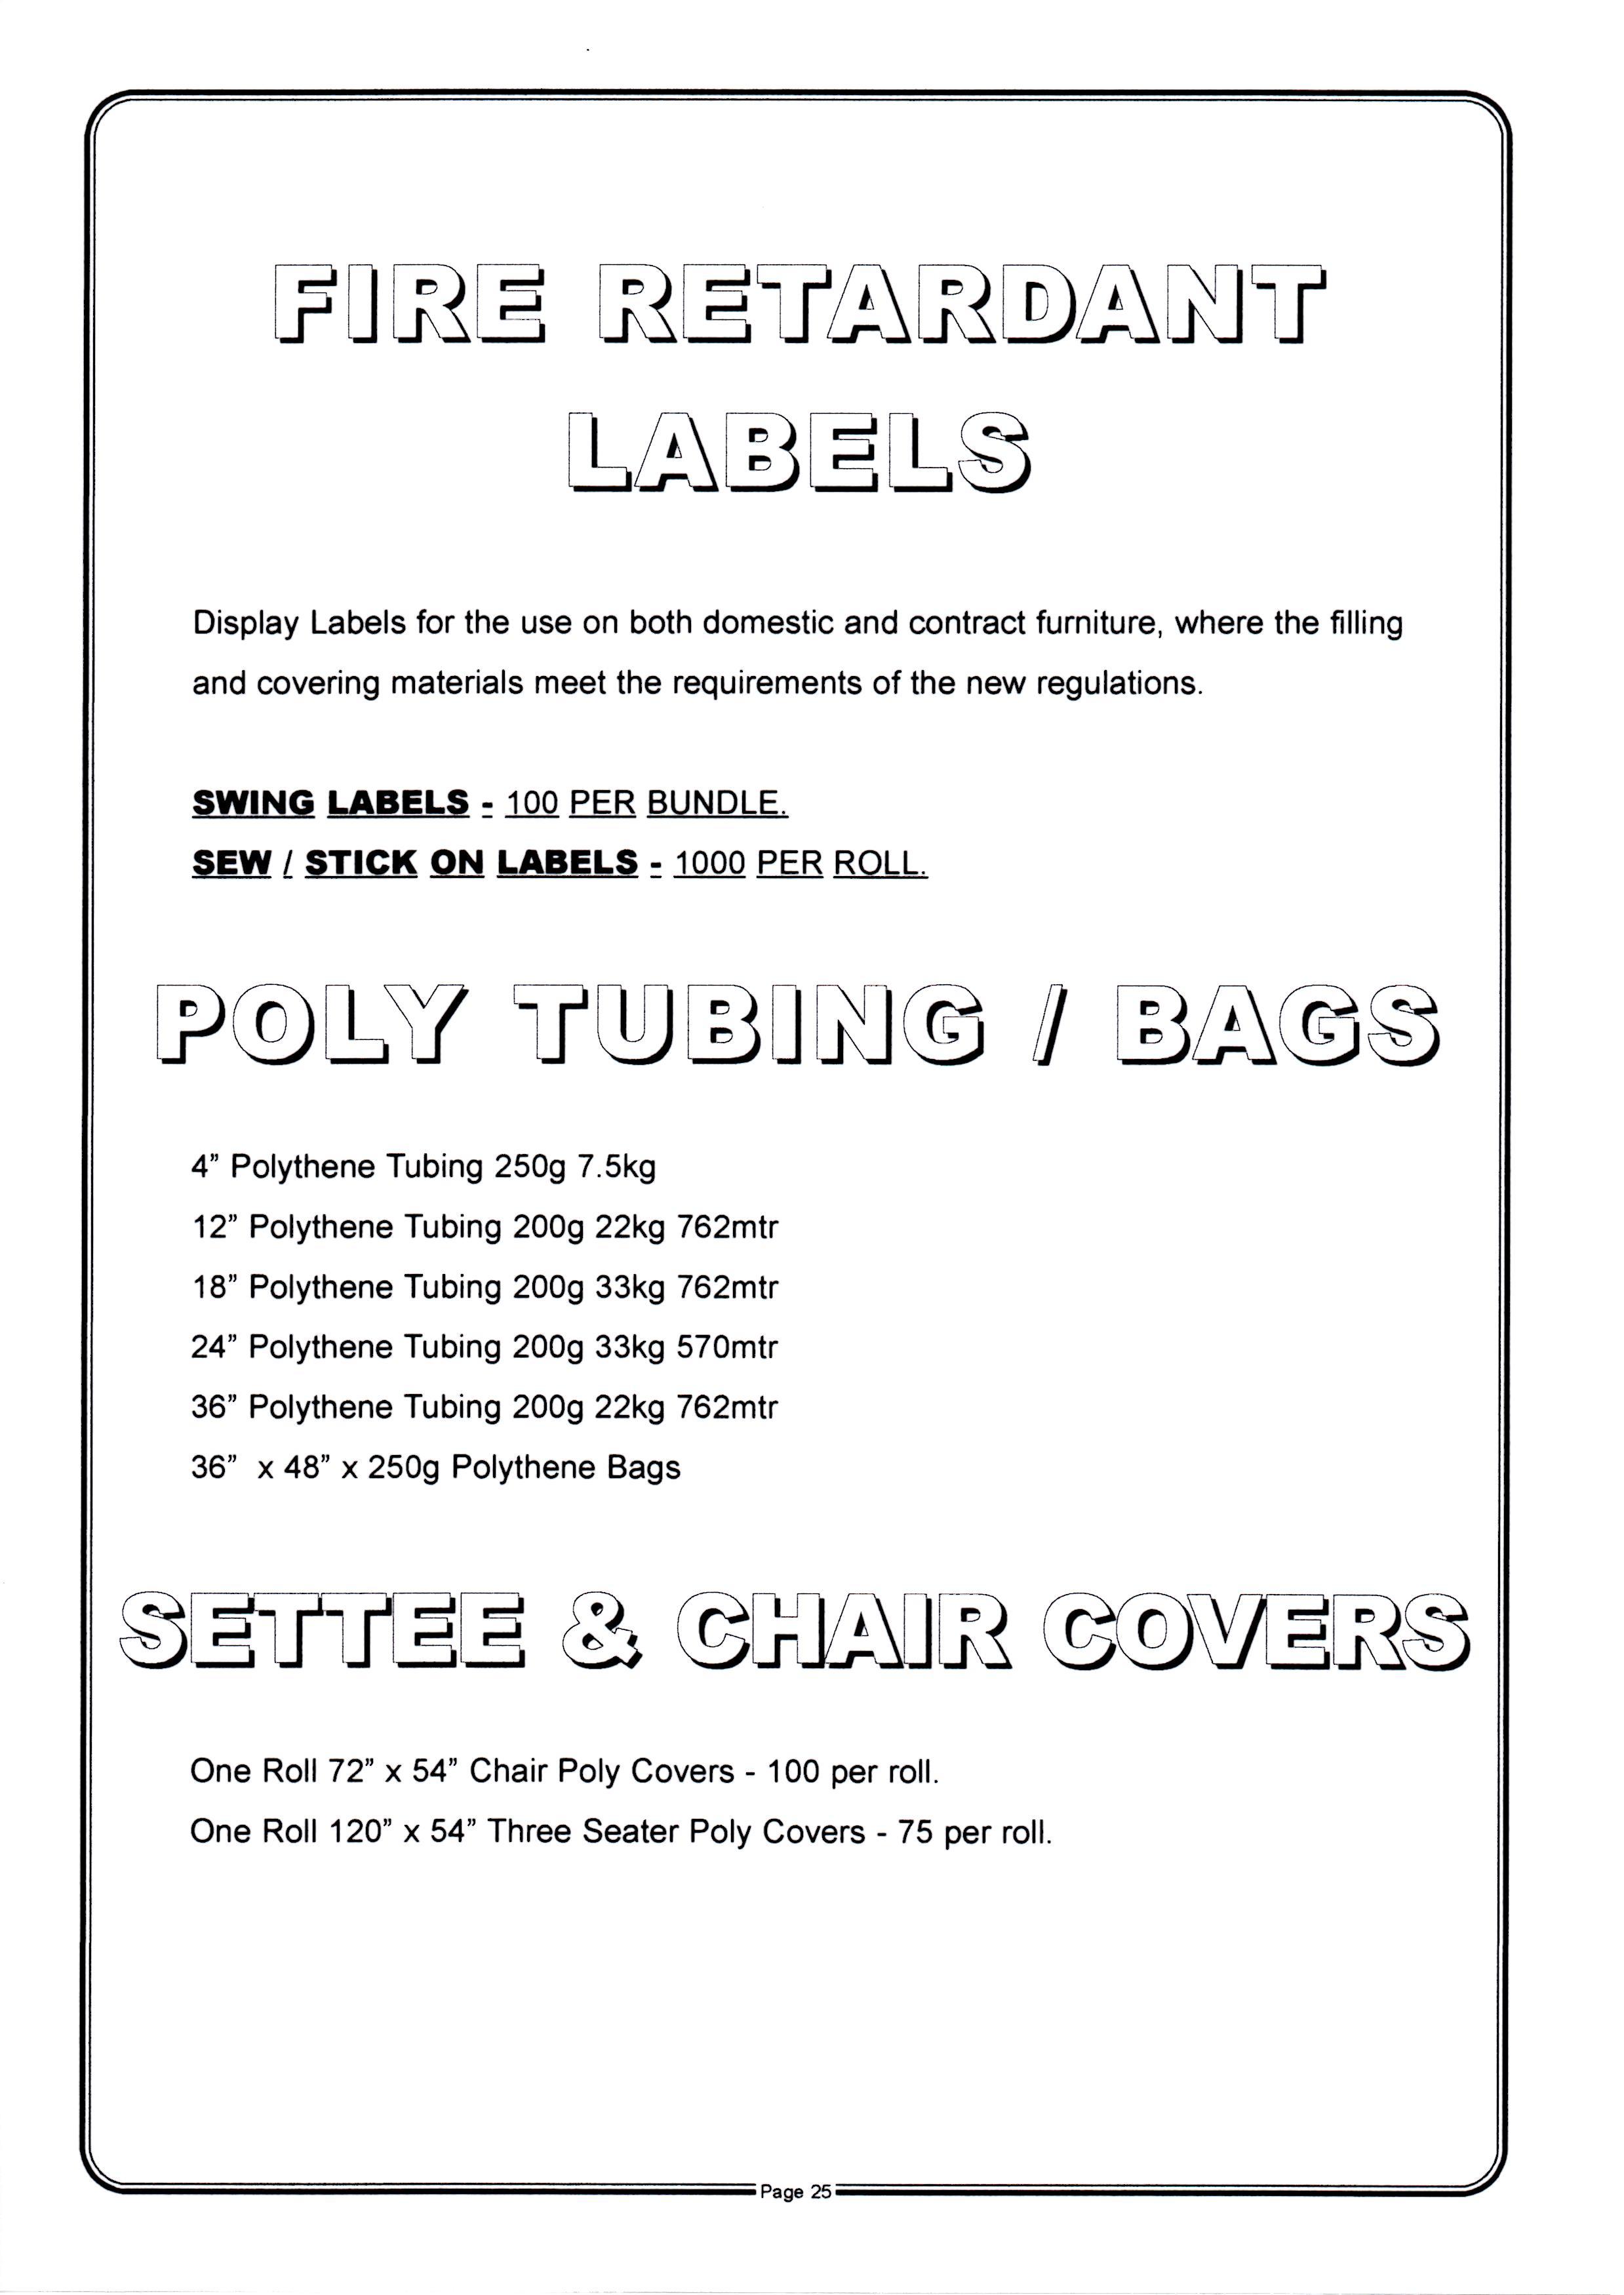 fire retardant certificate template - coopers birmingham ltd foam upholstery sundries